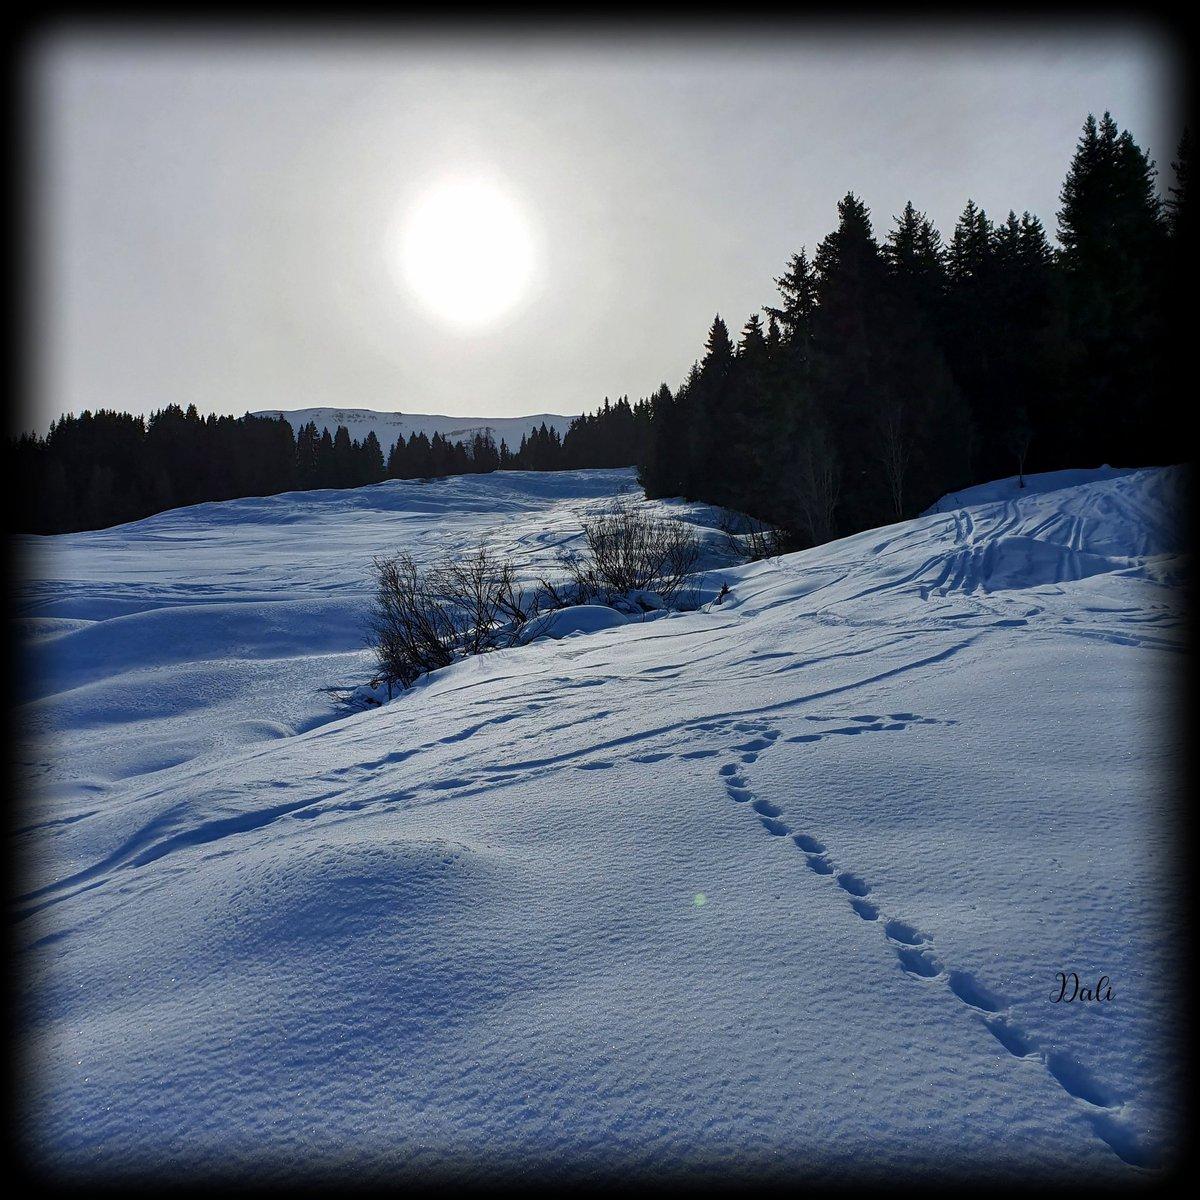 Let your beautiful light shine bright #graubunden #Switzerland #Schweiz #travelphotography #Travel #snow #hiking #picofthedaypic.twitter.com/H6fSxB4VDB